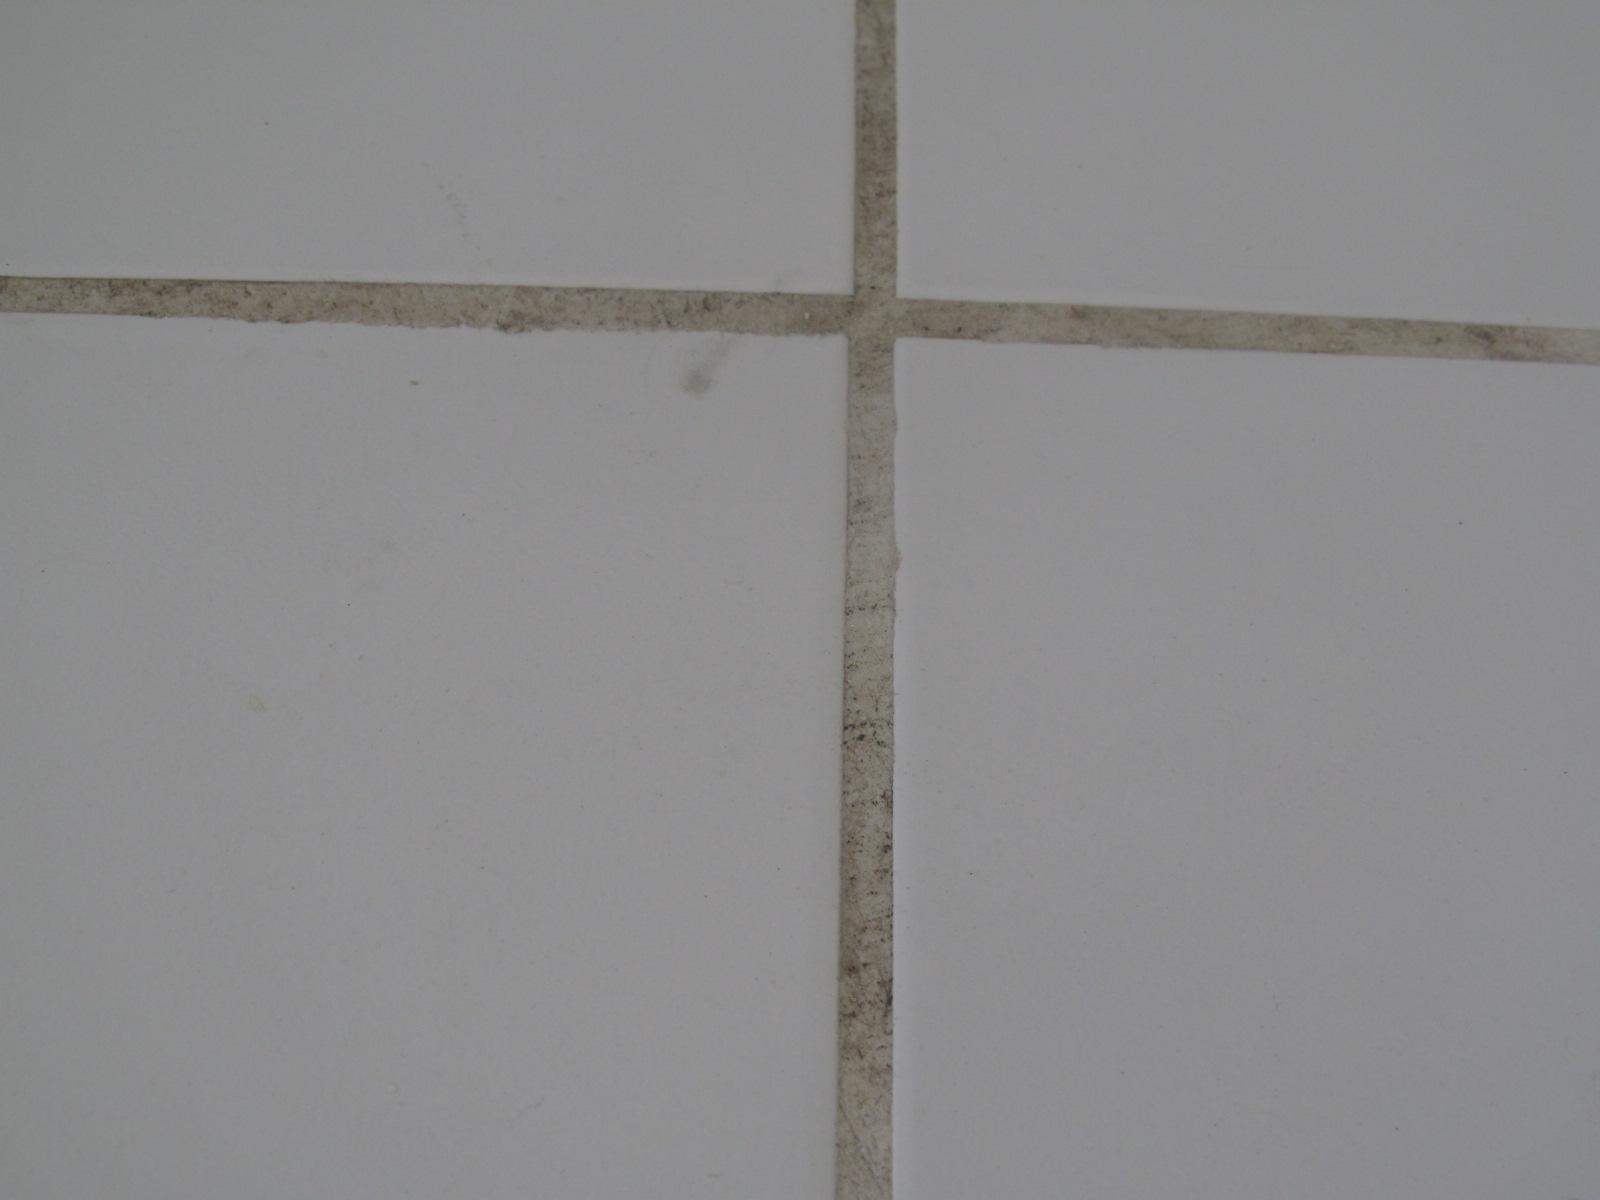 Dicas Para Limpar O Azulejo E Clarear O Rejunte HD Walls Find  #5A5146 1600 1200